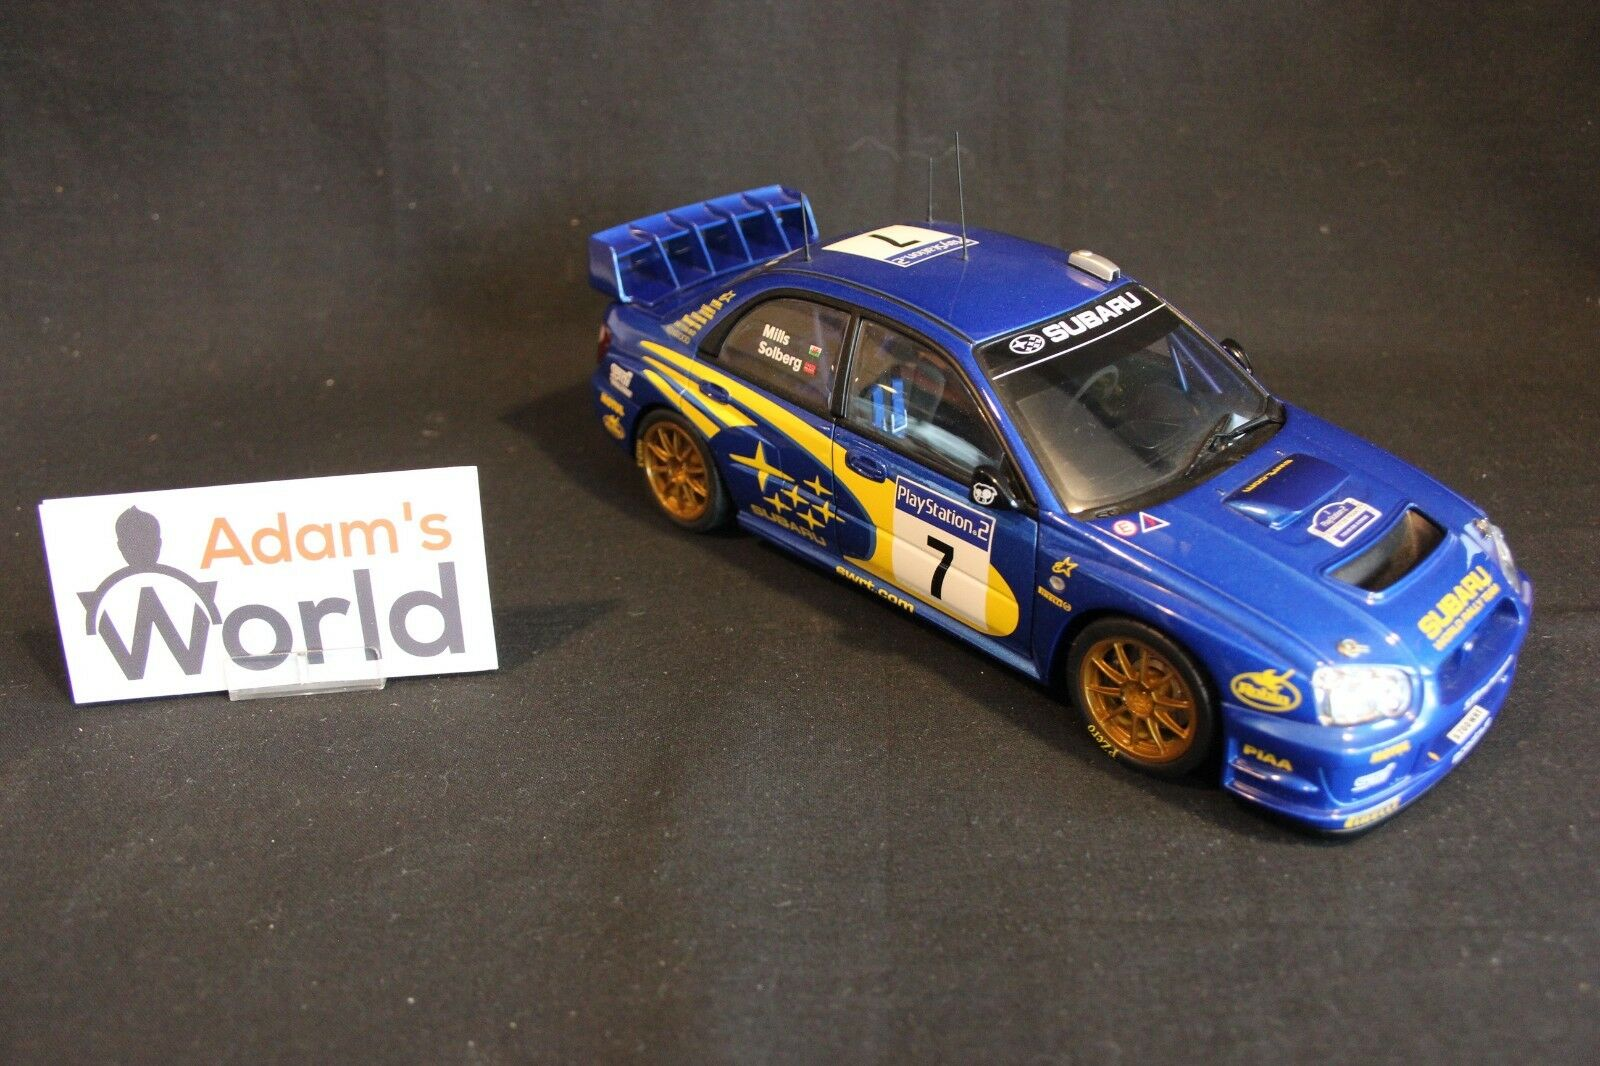 AutoArt Subaru Impreza S9 WRC  '03 1 18  7 Solberg   Mills Tour de Corse (JvdM)  profiter de vos achats